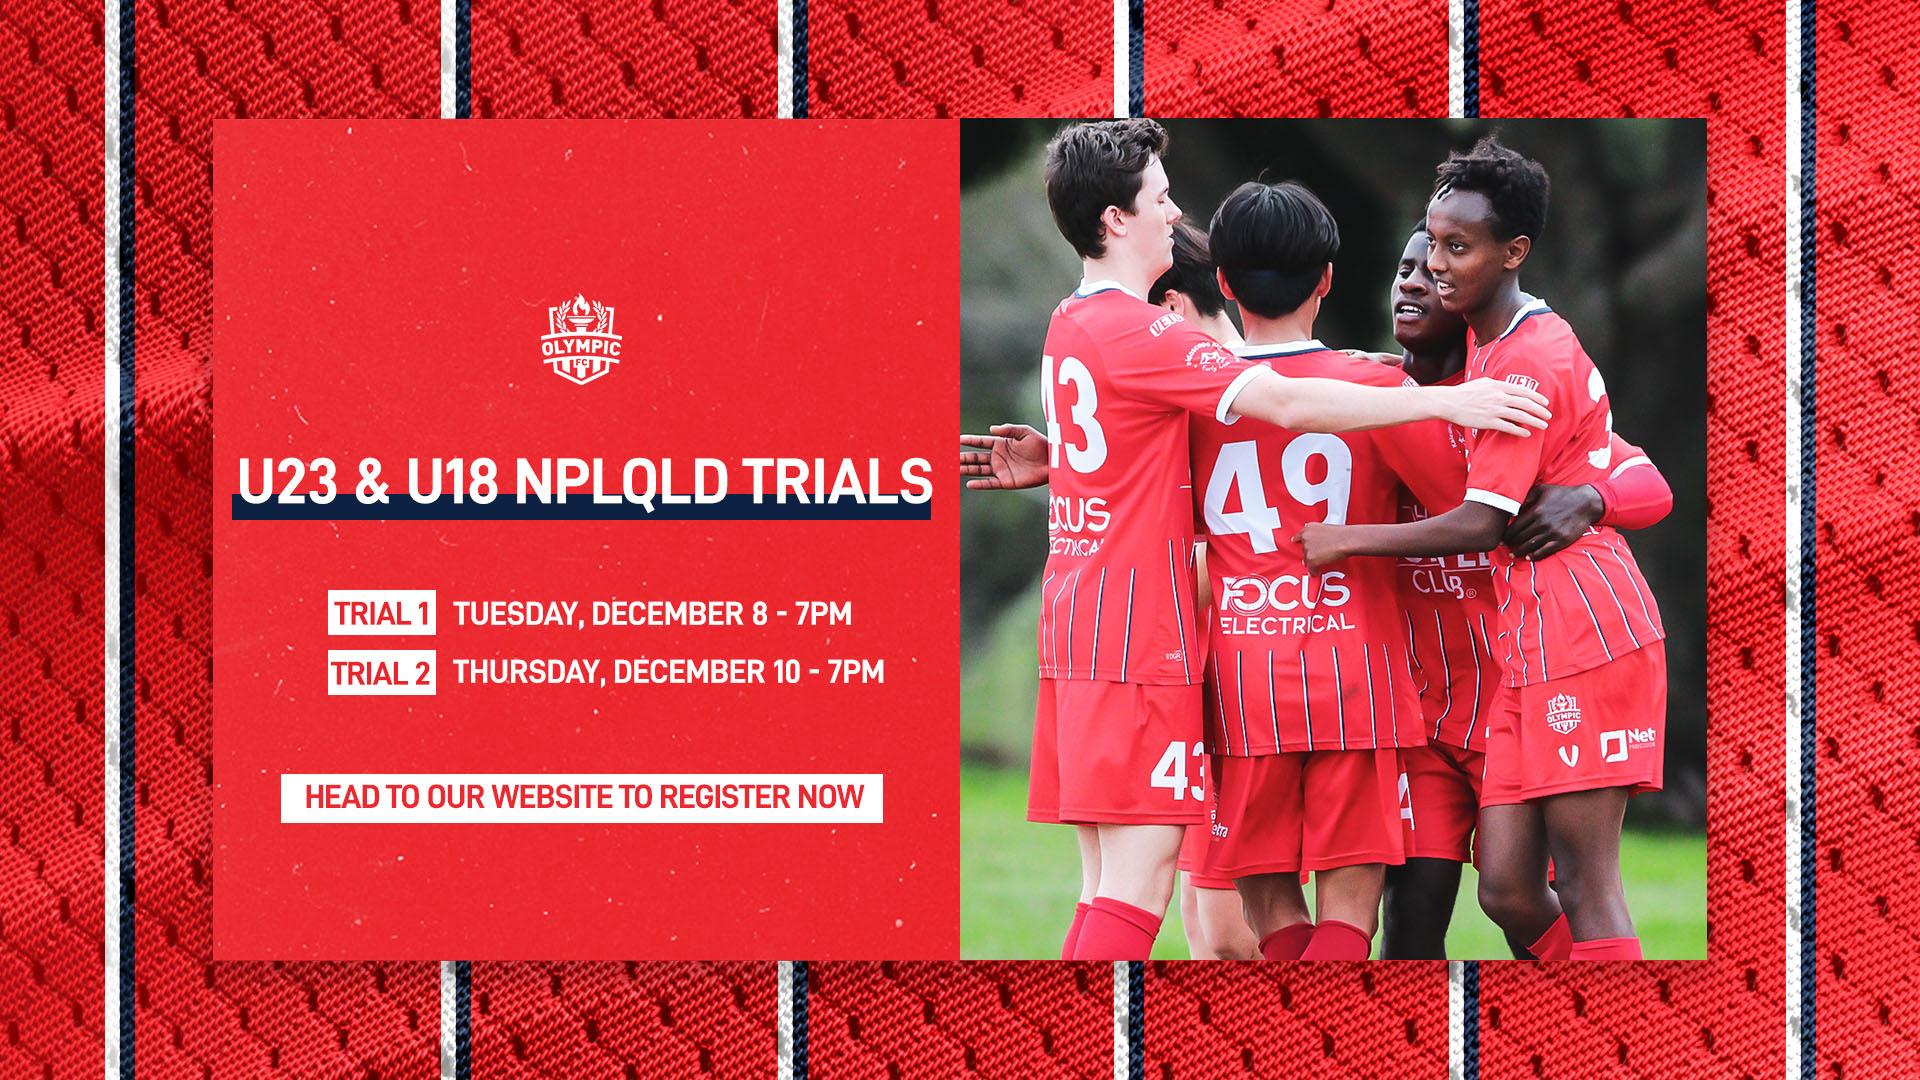 Olympic FC 2021 U23 & U18 NPL Queensland trials